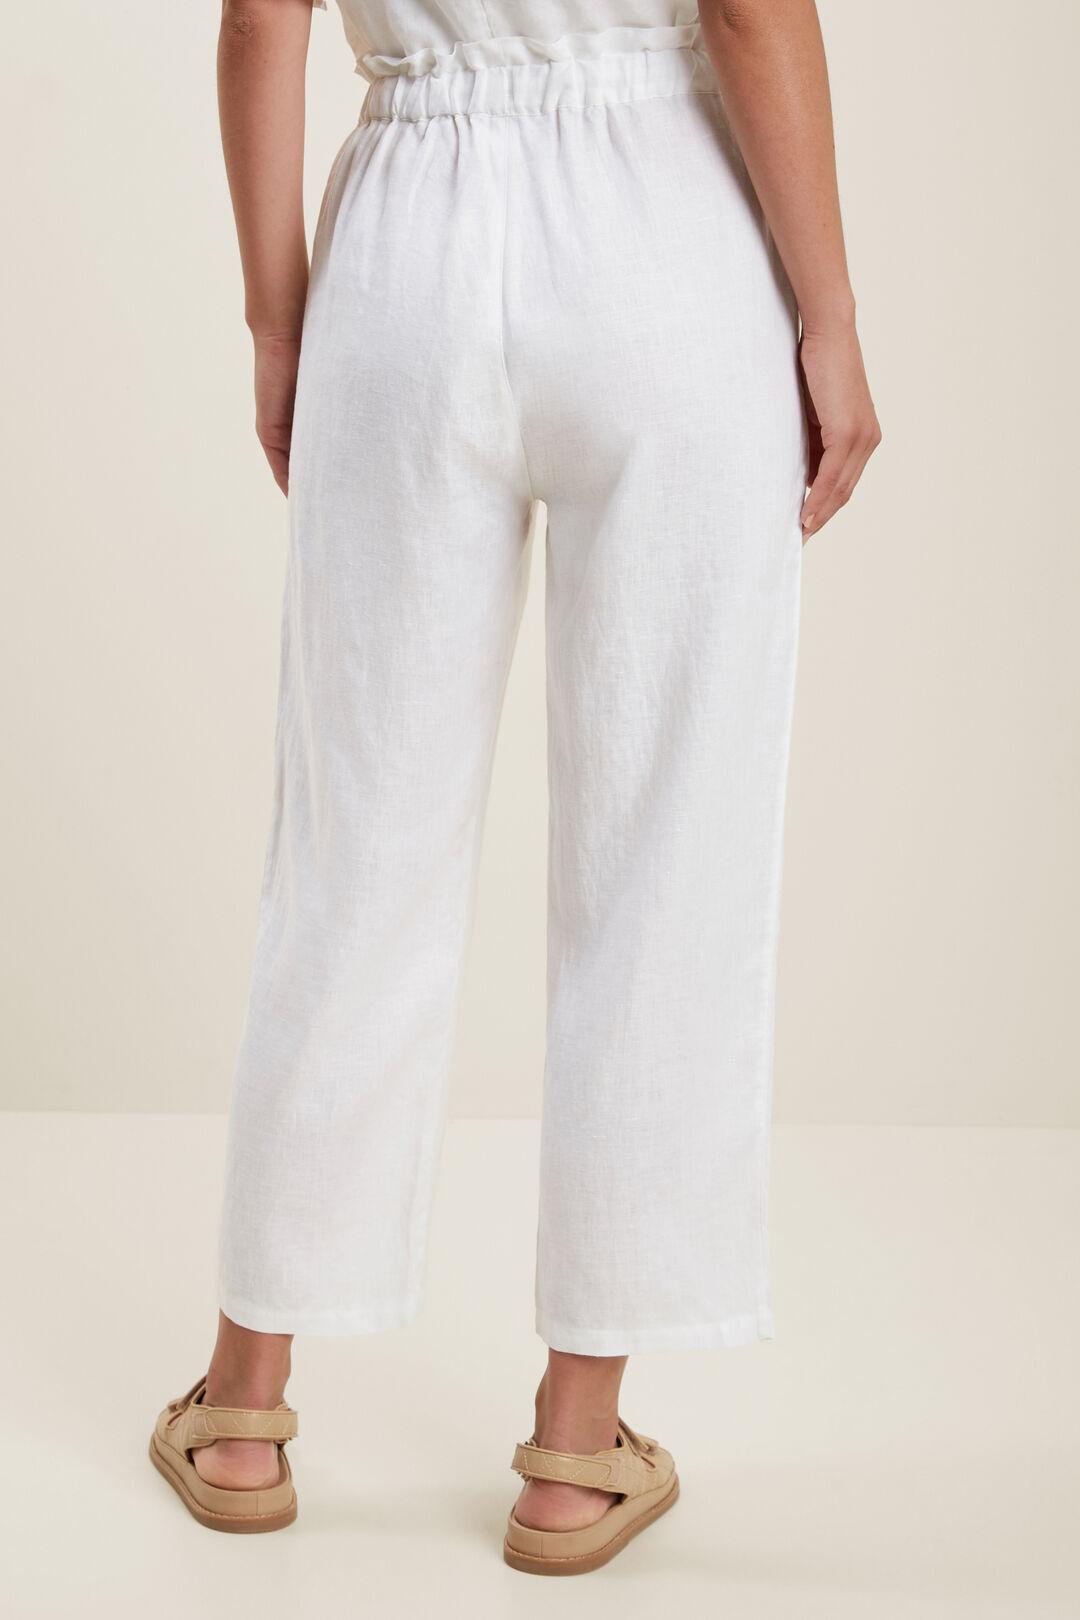 Core Linen Tie Up Pant  Whisper White  hi-res